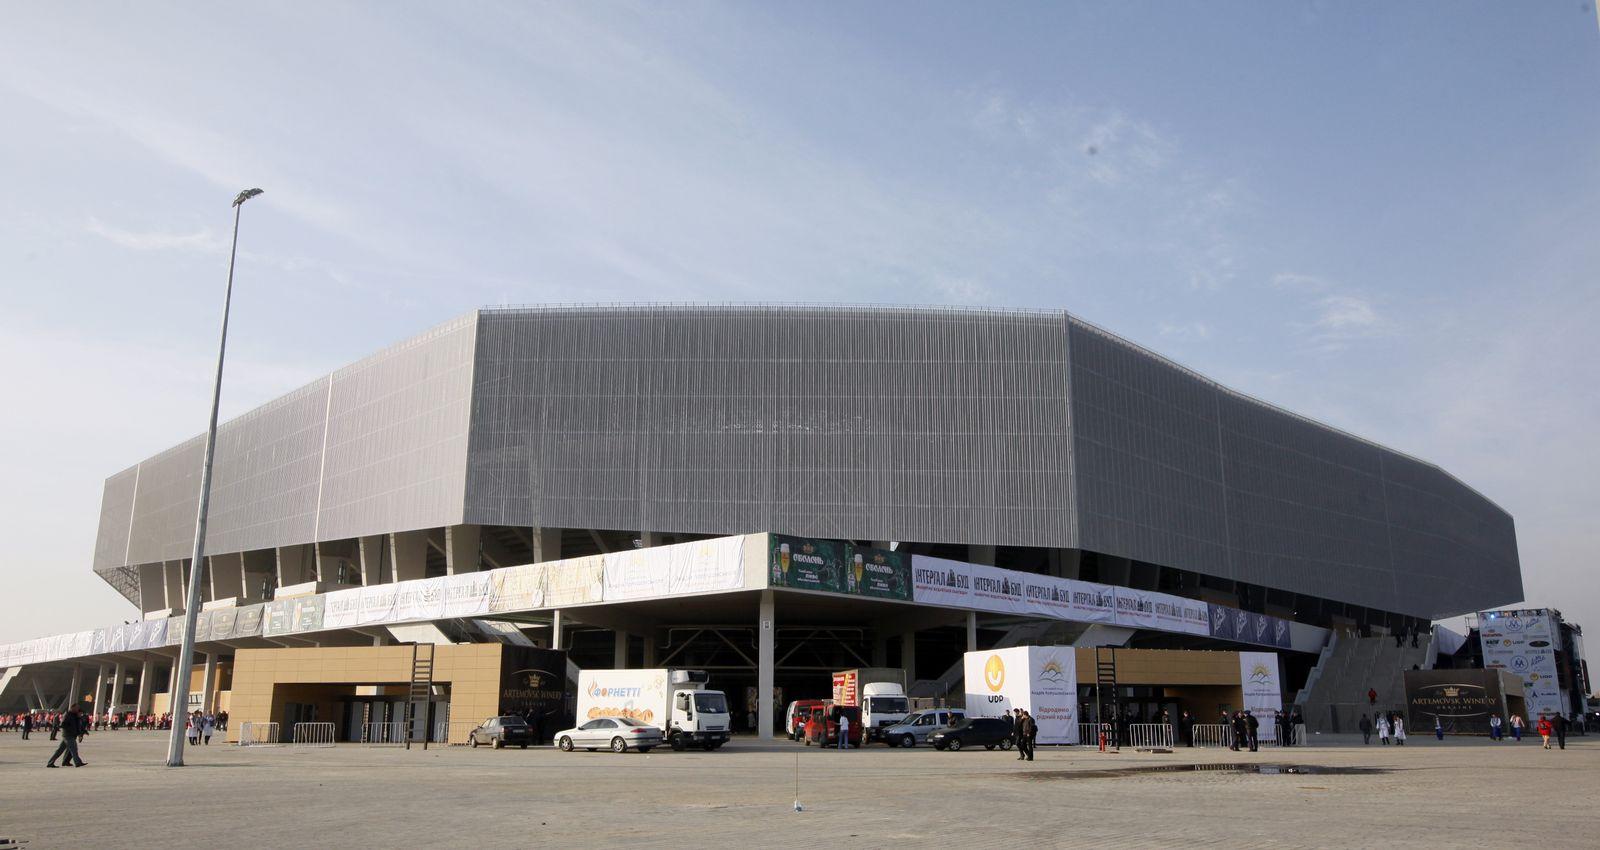 Stadion Lemberg / Lwiw Arena / Ukraine